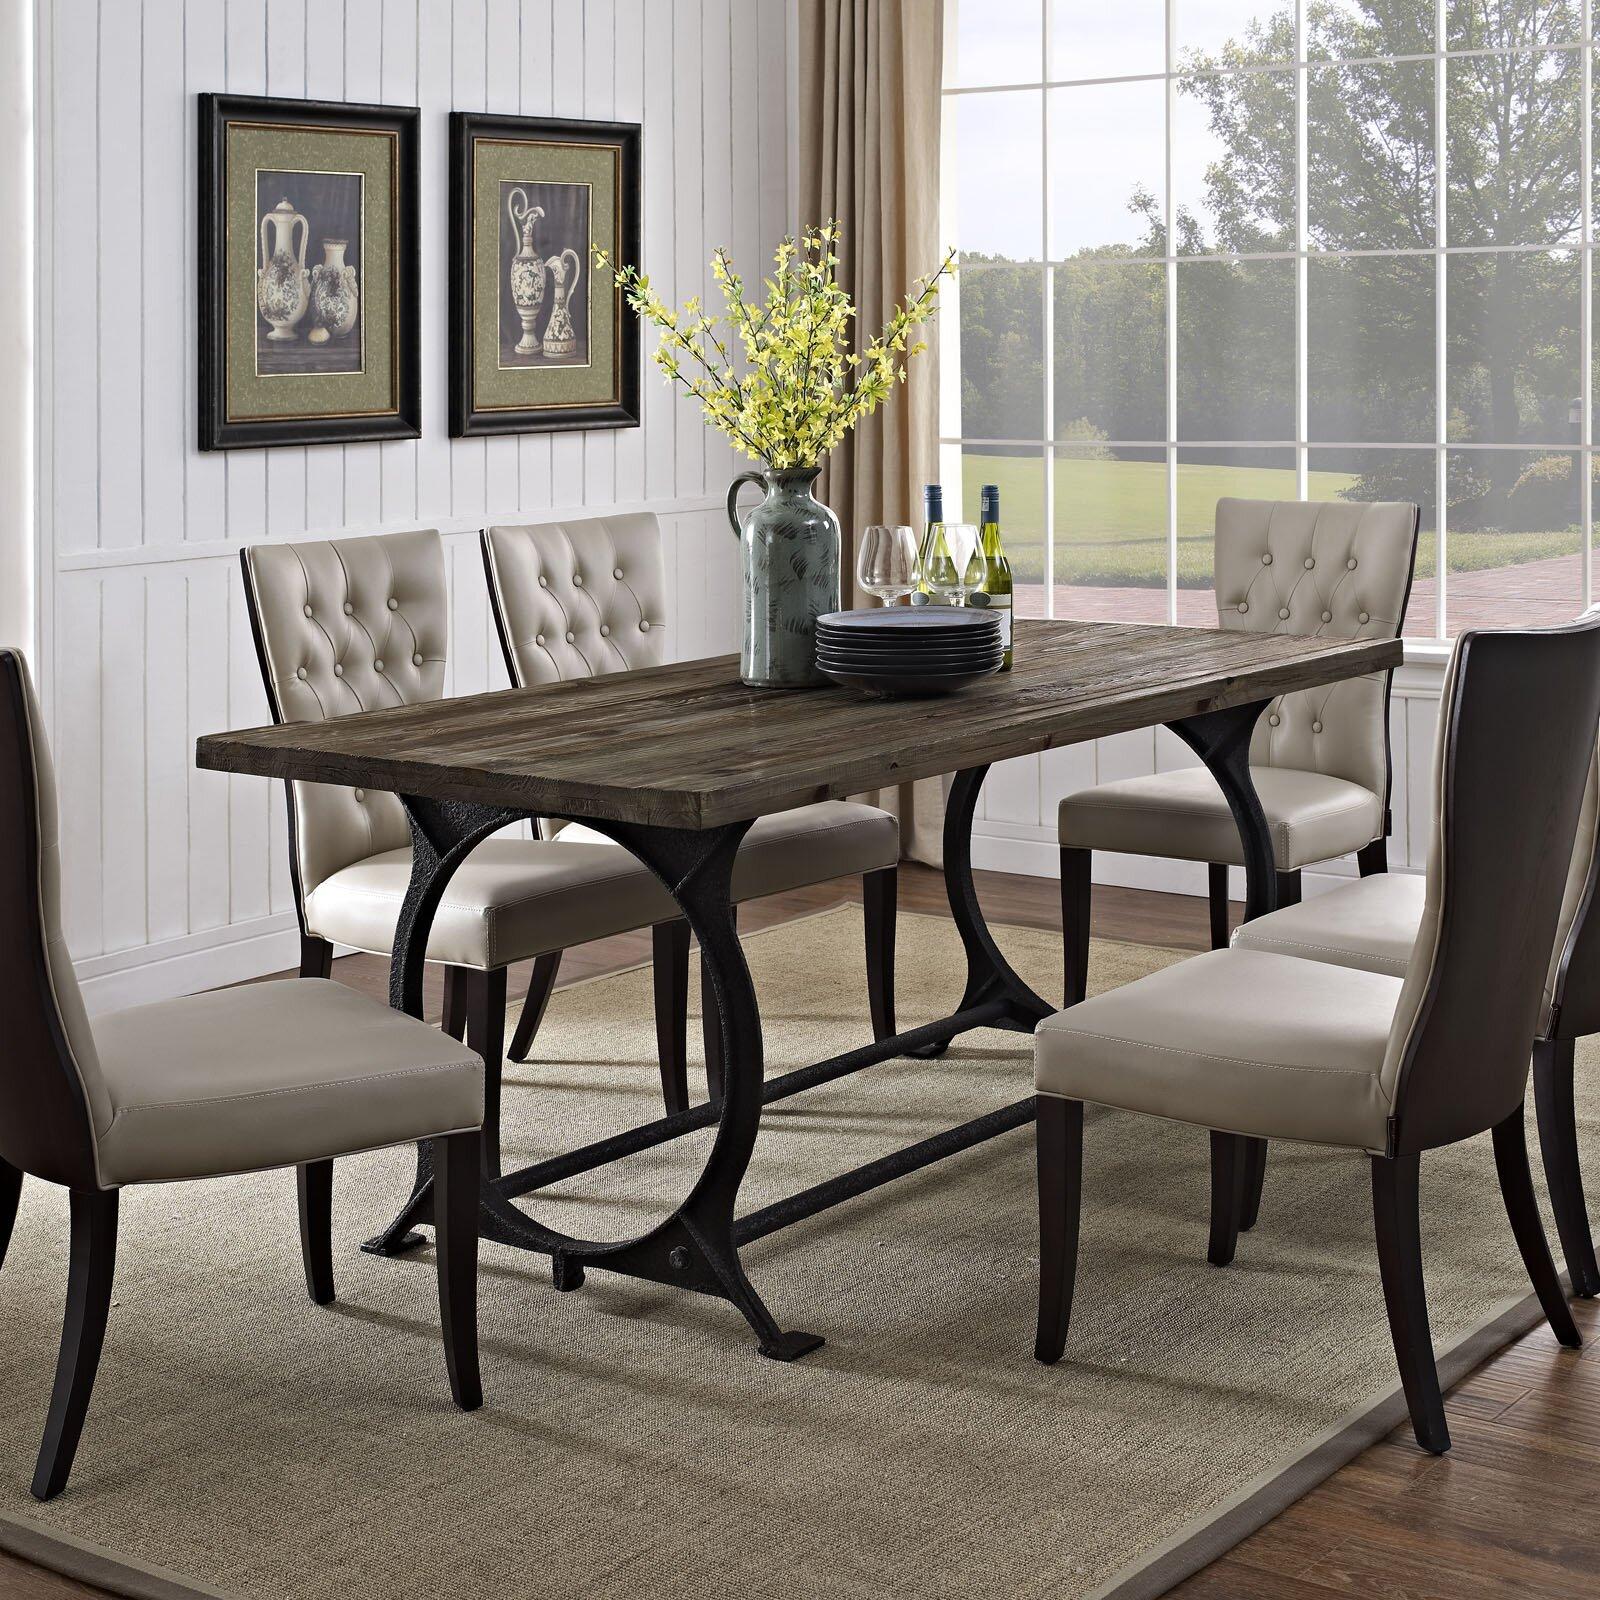 trent austin design jackson dining table